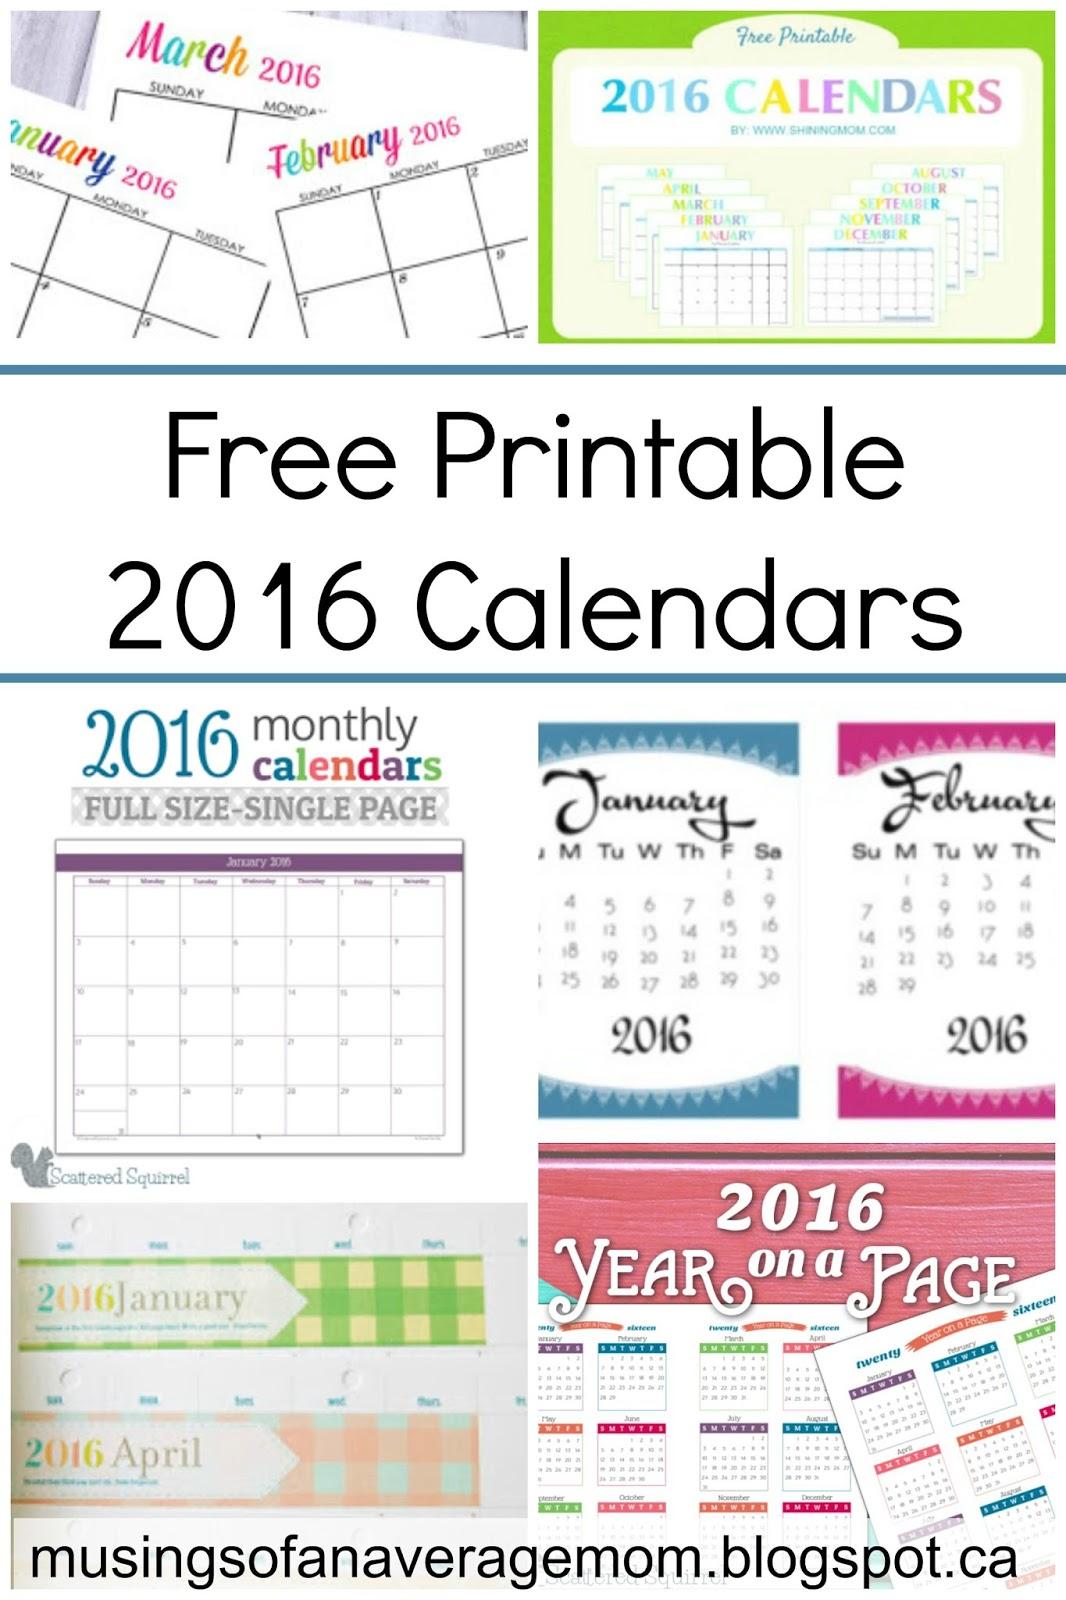 Calendar Free Printable : Musings of an average mom free printable calendar